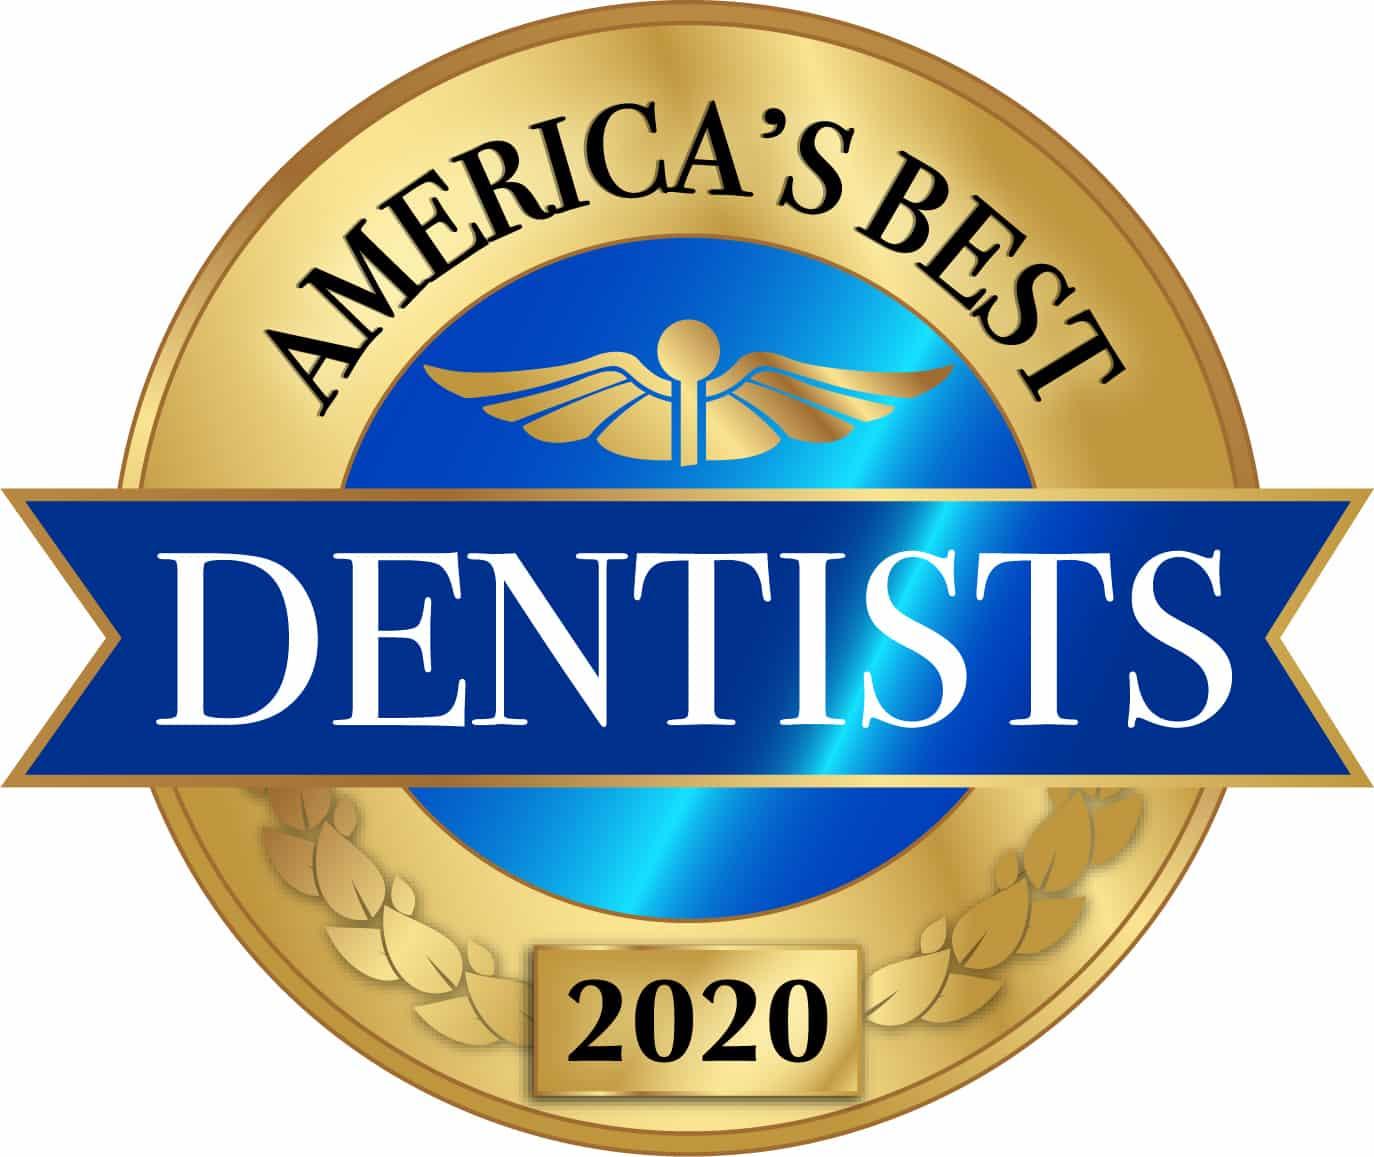 dentistsroundemblem2020